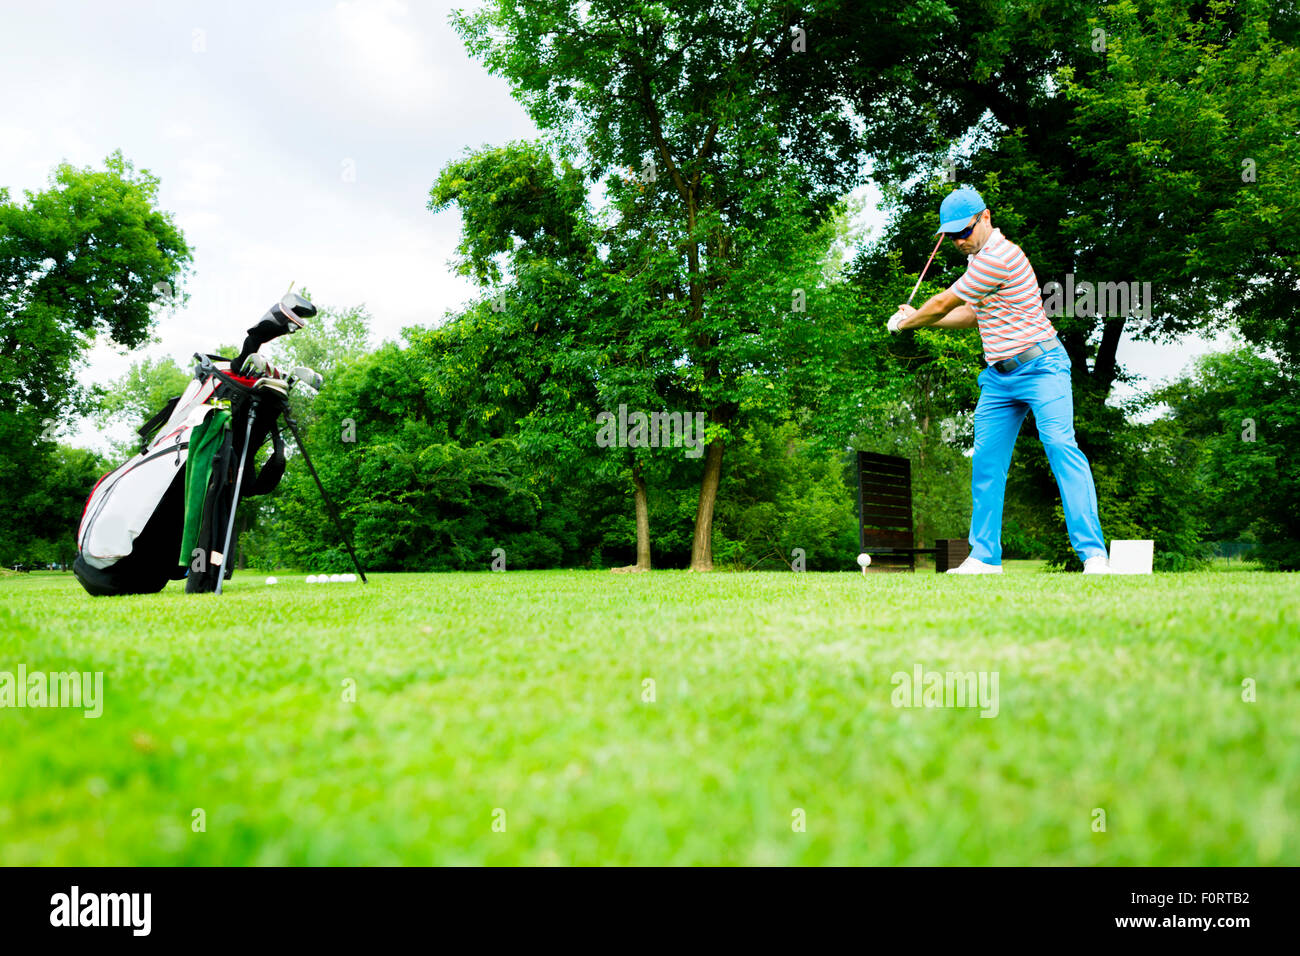 Golfer, die immer bereit, den ersten langen Schlag Stockbild